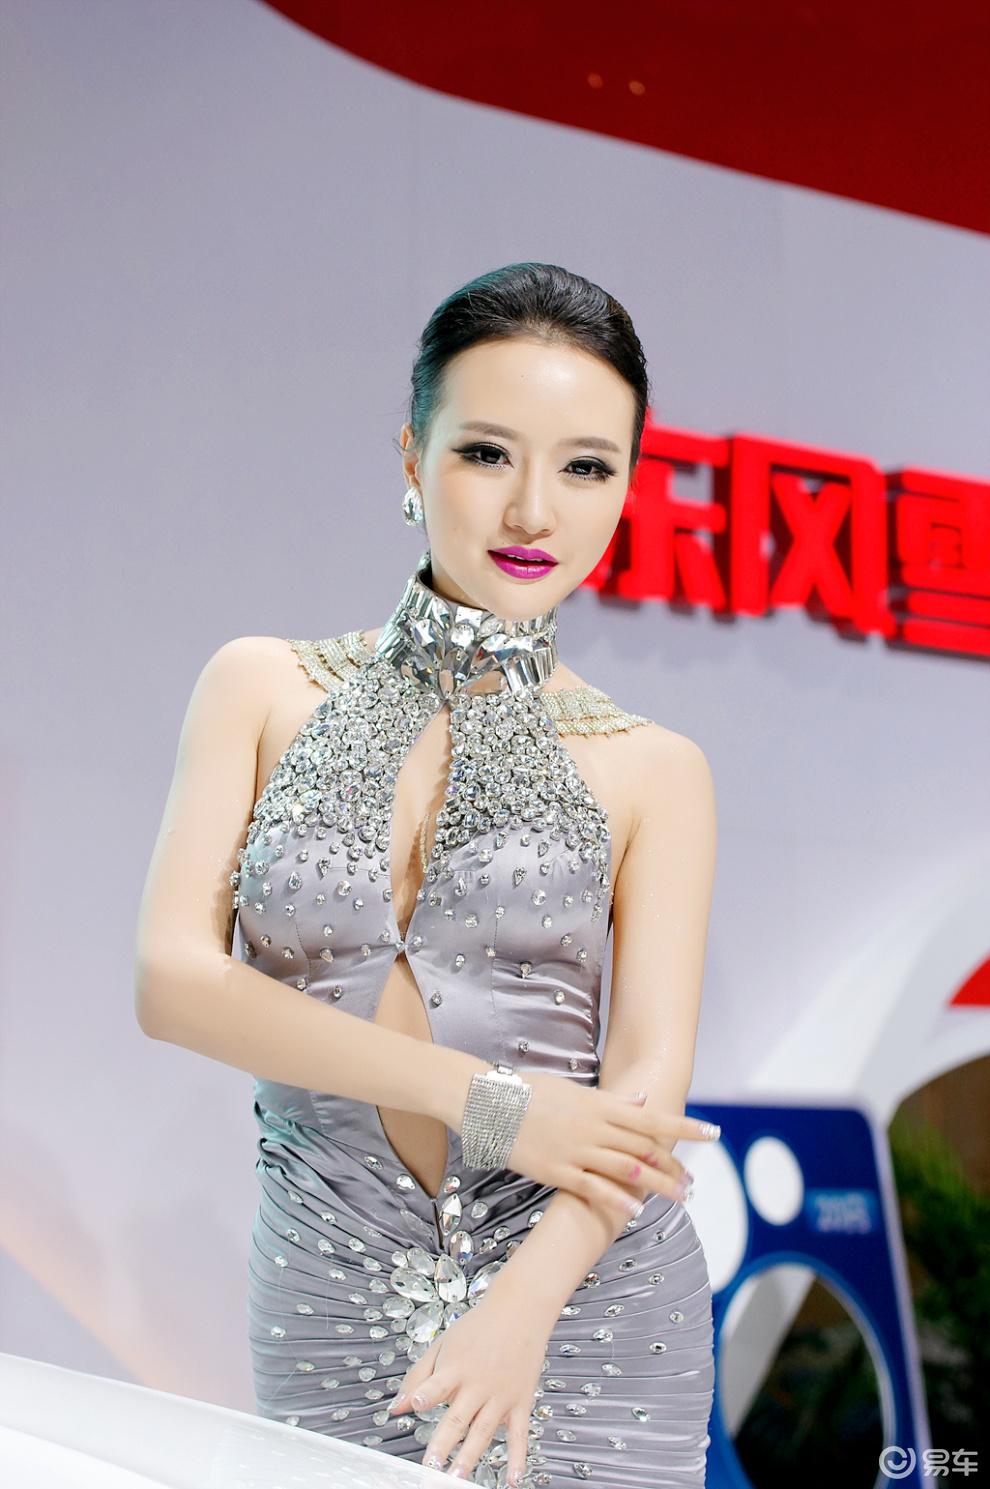 2 chinese girls bondage game full 4